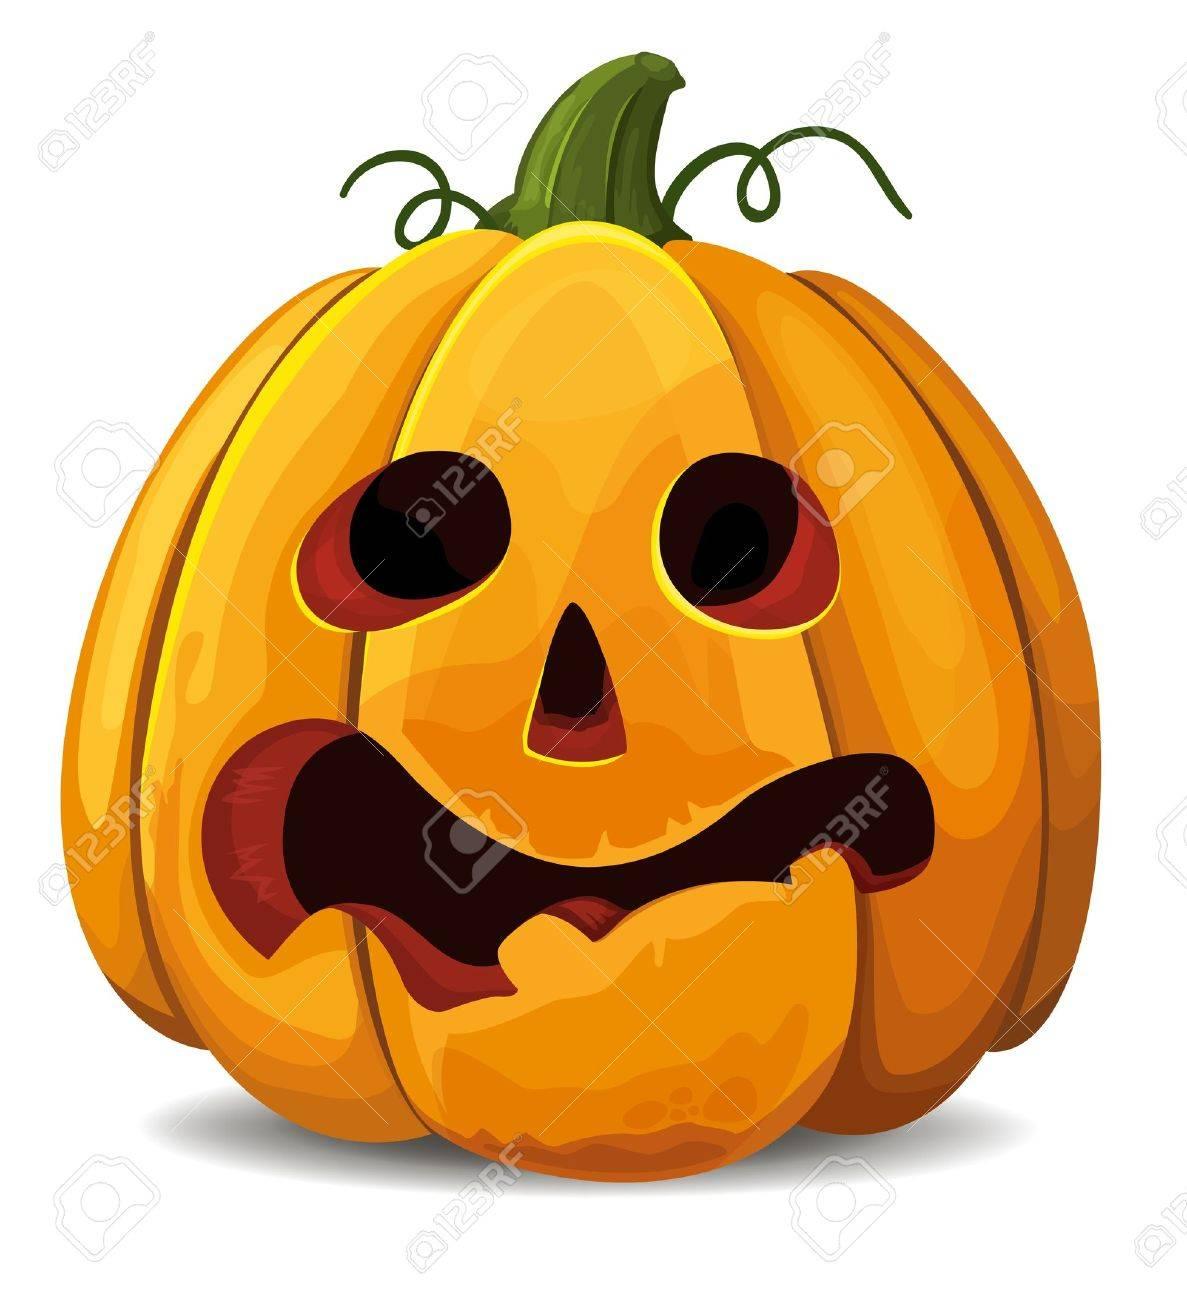 Scared Halloween Pumpkin - 15506213